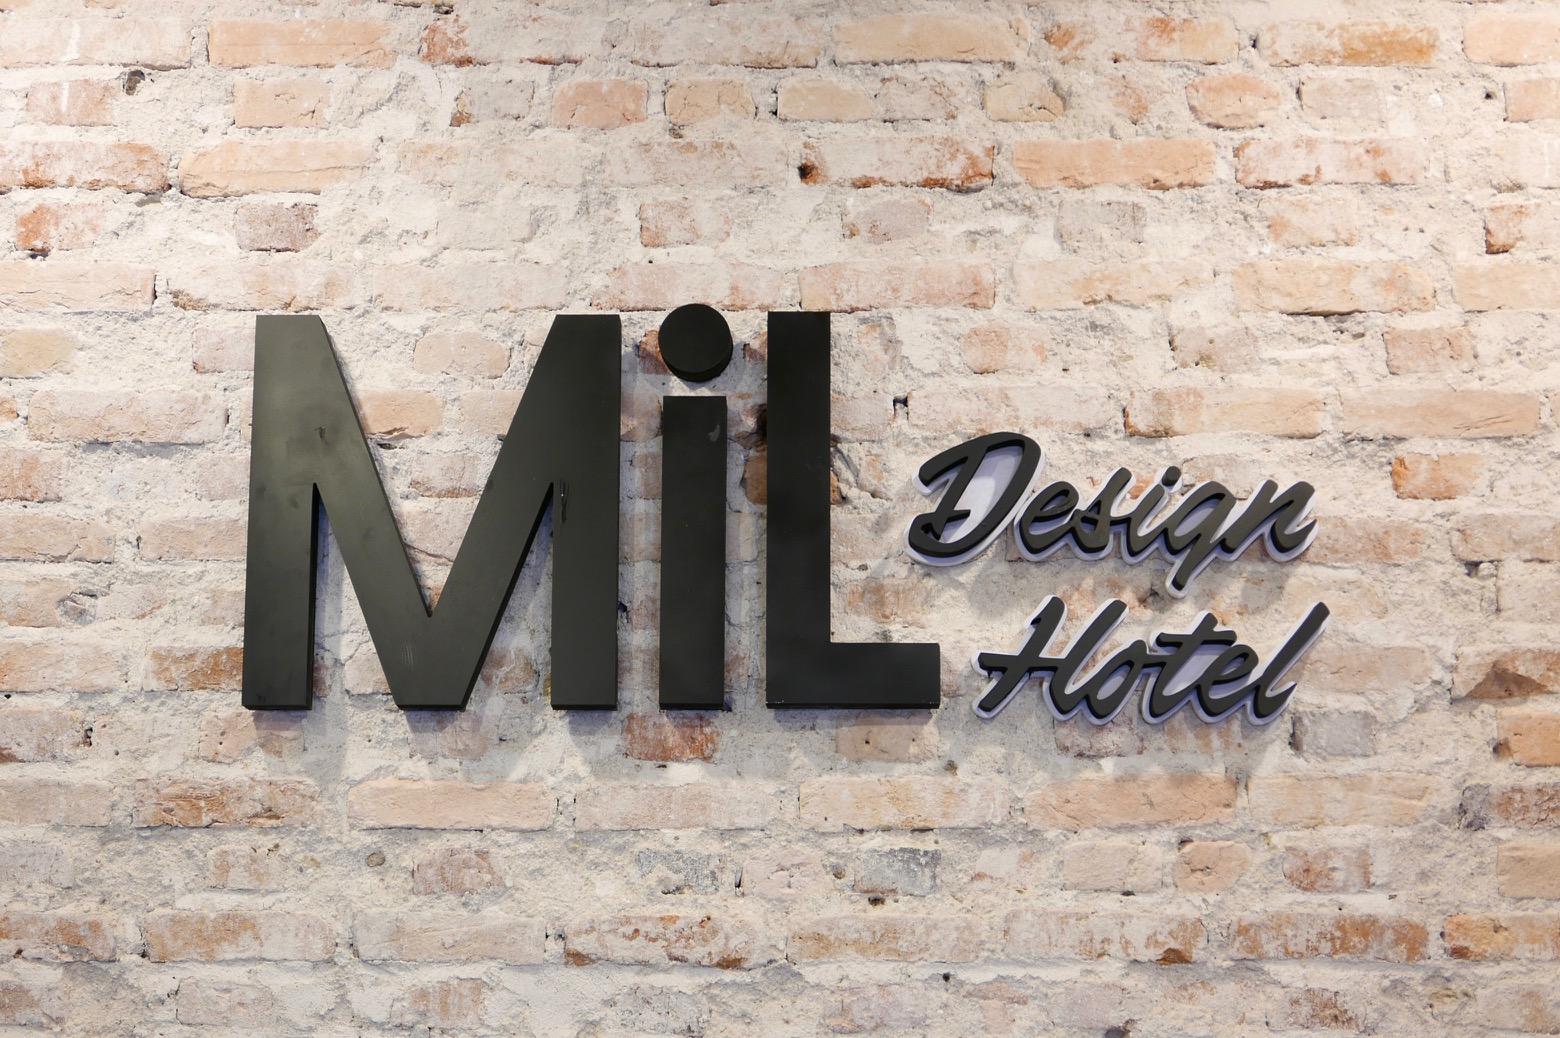 Mil Design Hotel Kuala Lumpur, Kuala Lumpur